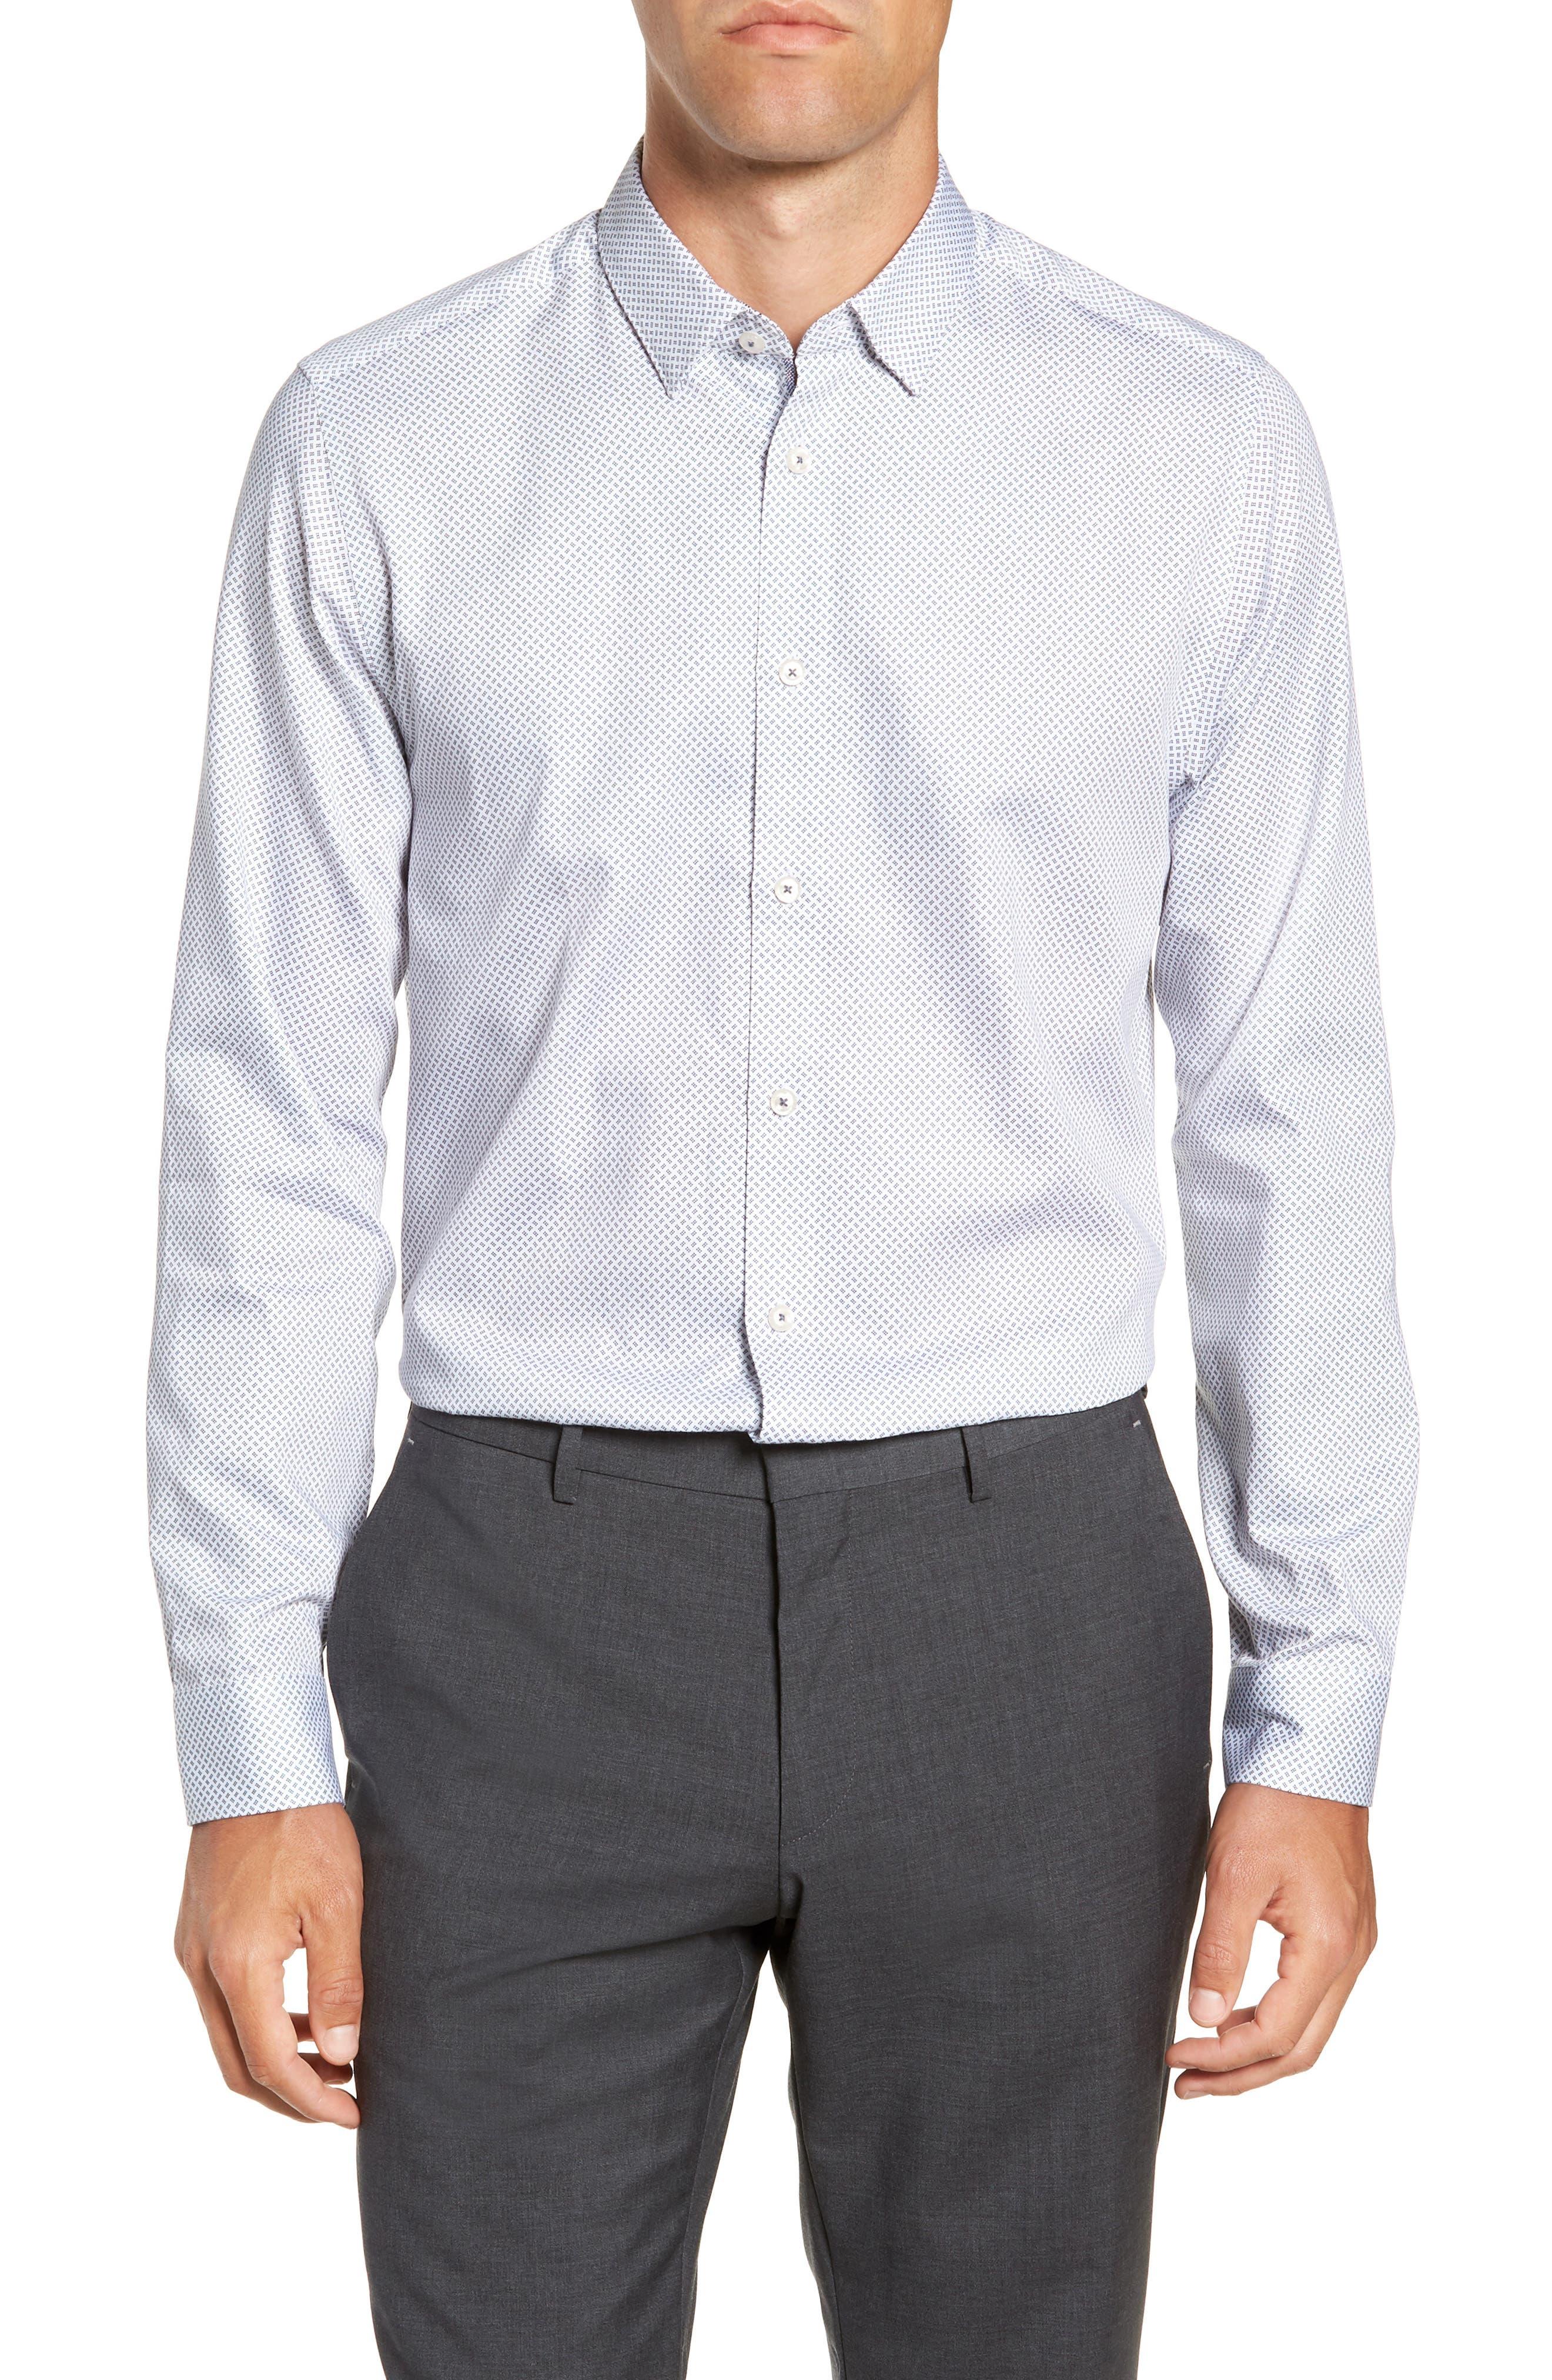 Aspara Modern Fit Geometric Dress Shirt,                         Main,                         color, WHITE/ NAVY